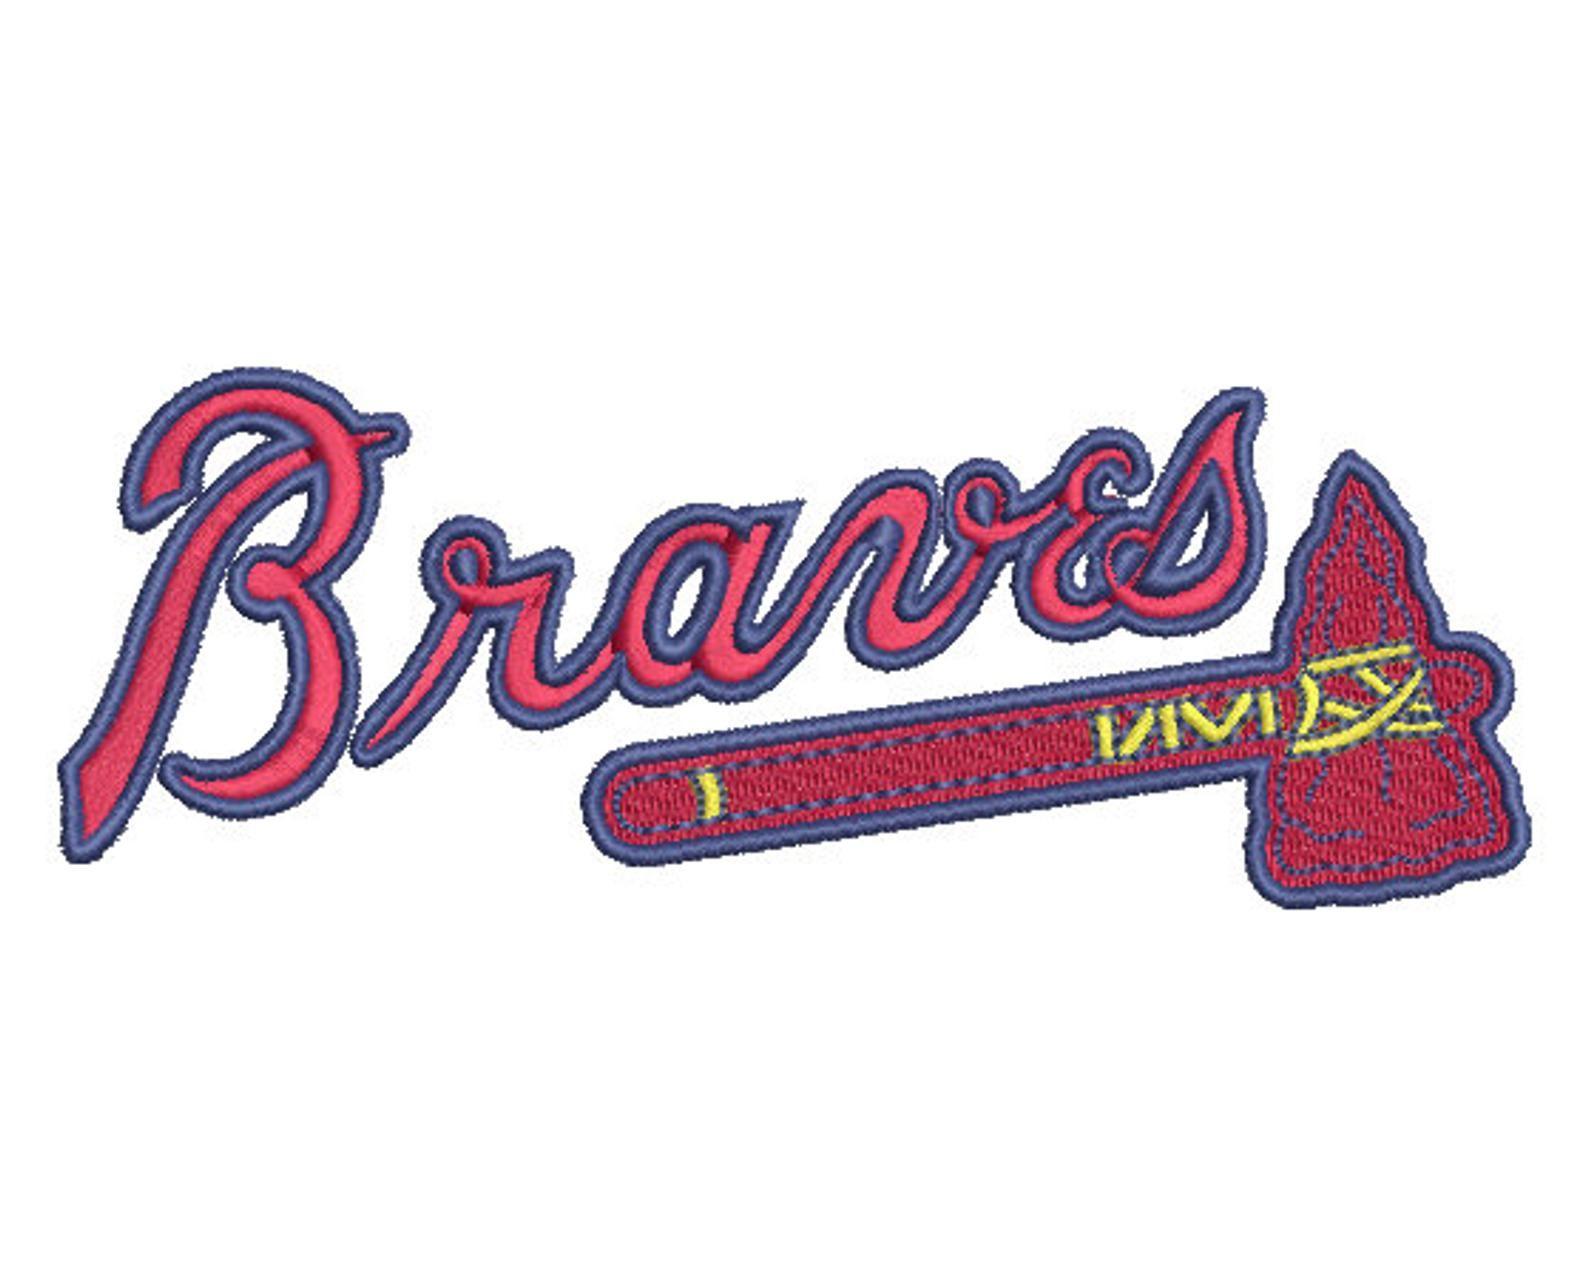 Atlanta Braves Embroidery Design 1 5 Sizes Image 0 Atlanta Braves Logo Atlanta Braves Braves